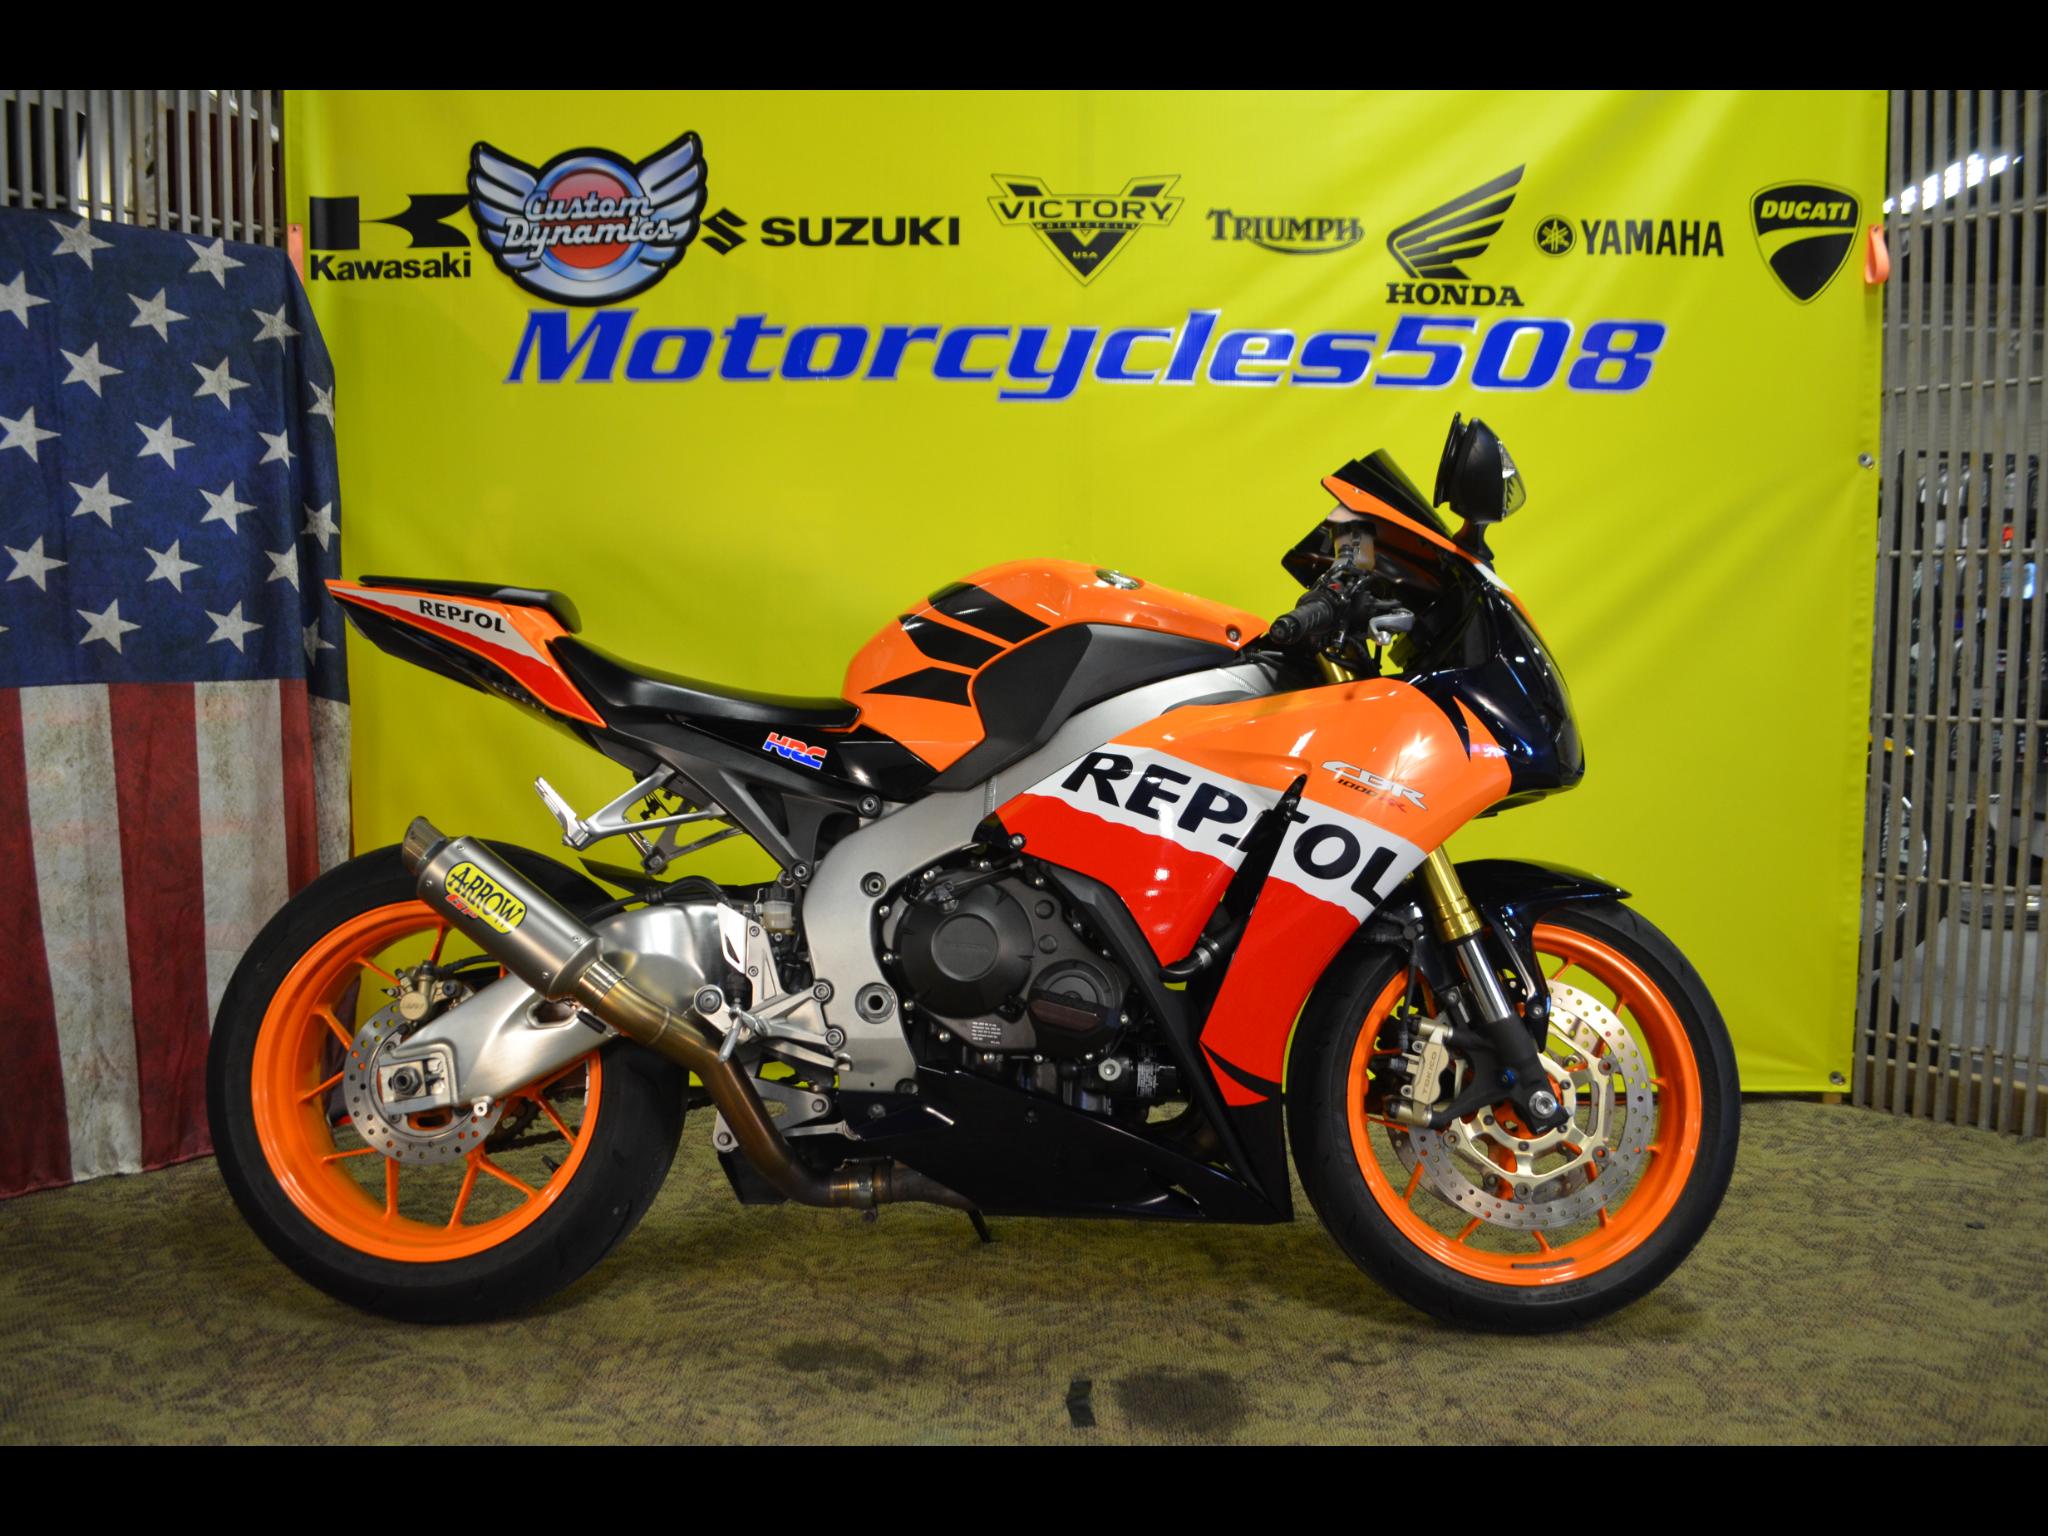 2013 Honda CBR1000RR Repsol